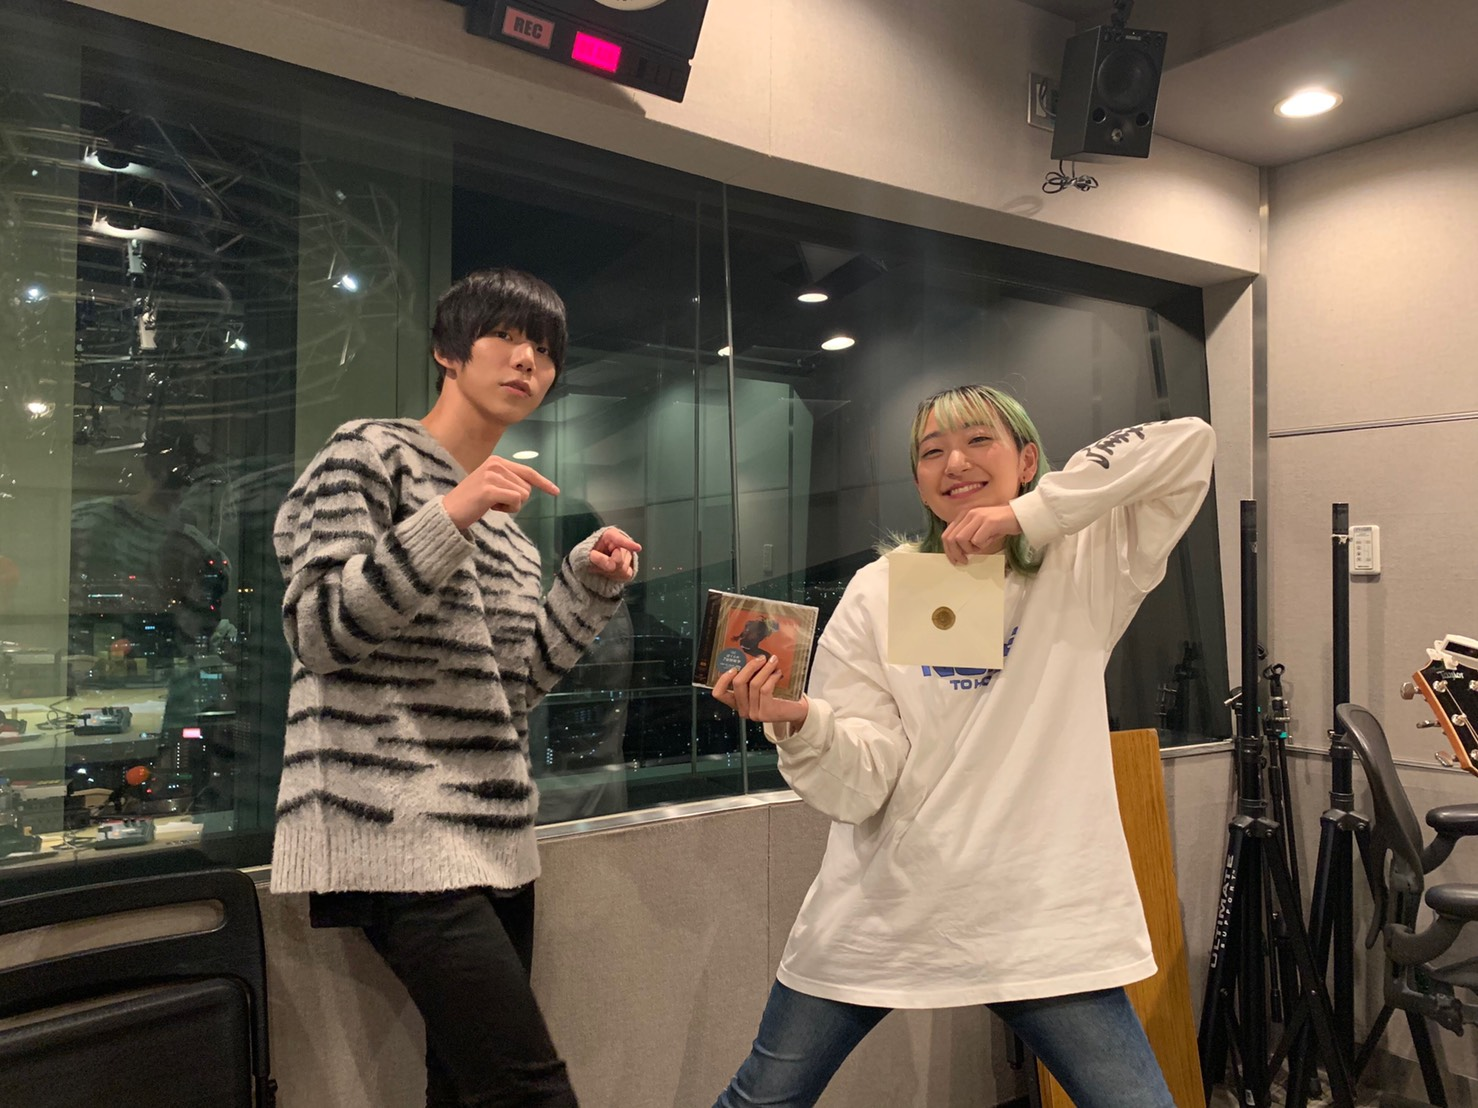 Sano ibukiの生演奏に反響多数! 「イヤホン必須」のスタジオライブ【音源あり】